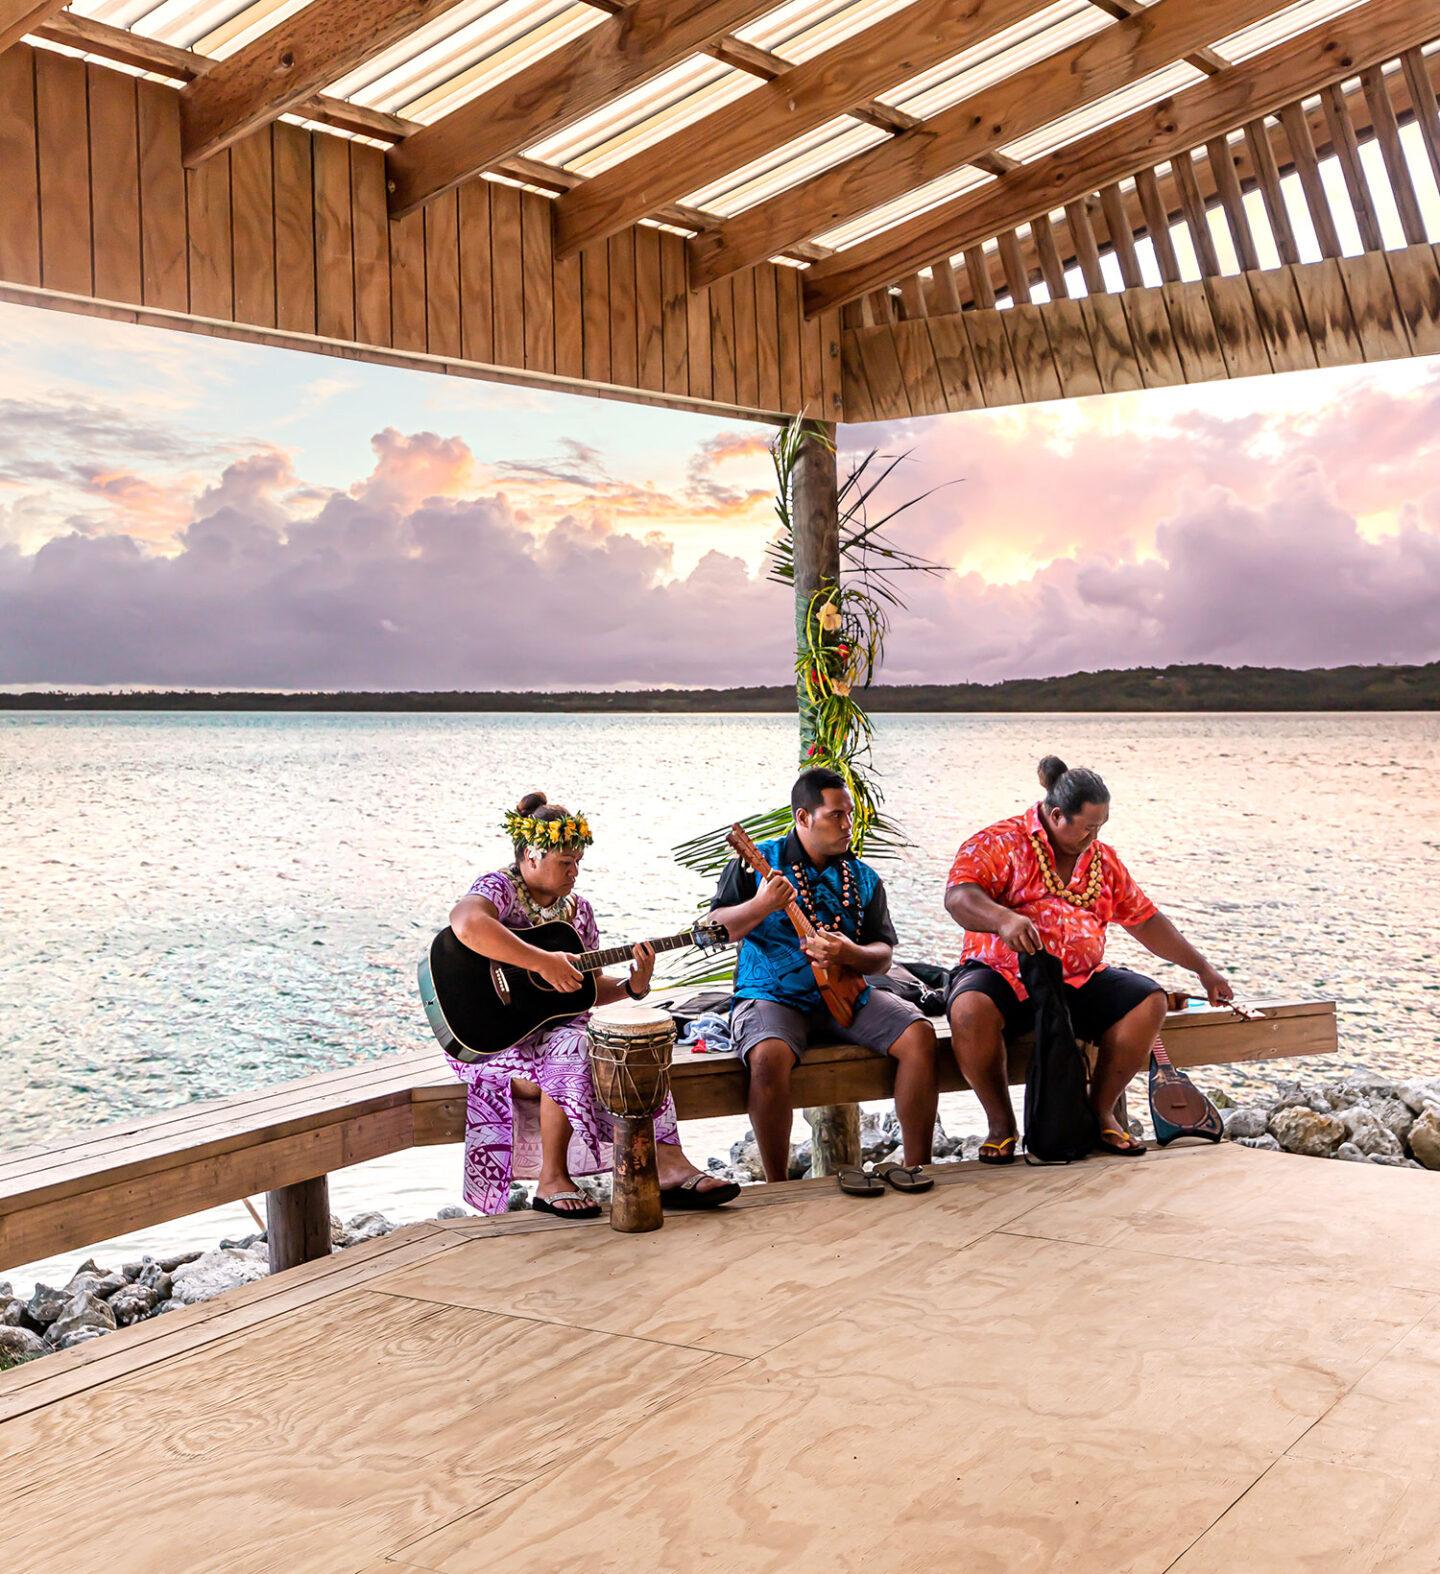 Island Night at Aitutaki Village- Cook Islands Travel Guide – Rarotonga – Aitutaki – Kelsey Heinrichs - @kelseyinlondon